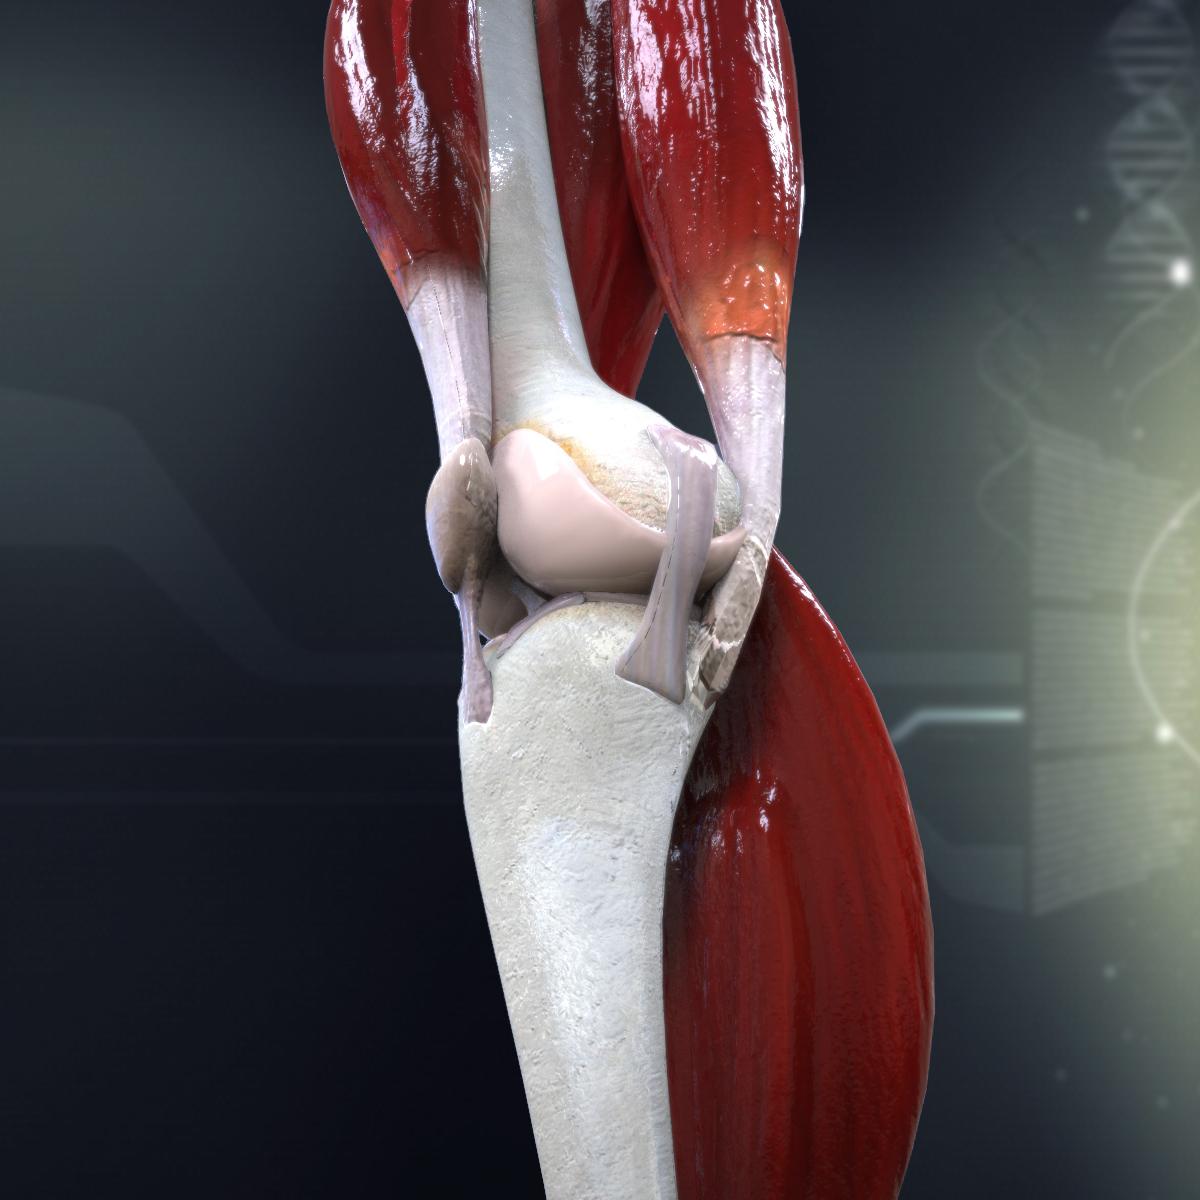 Human Knee Anatomy 3d